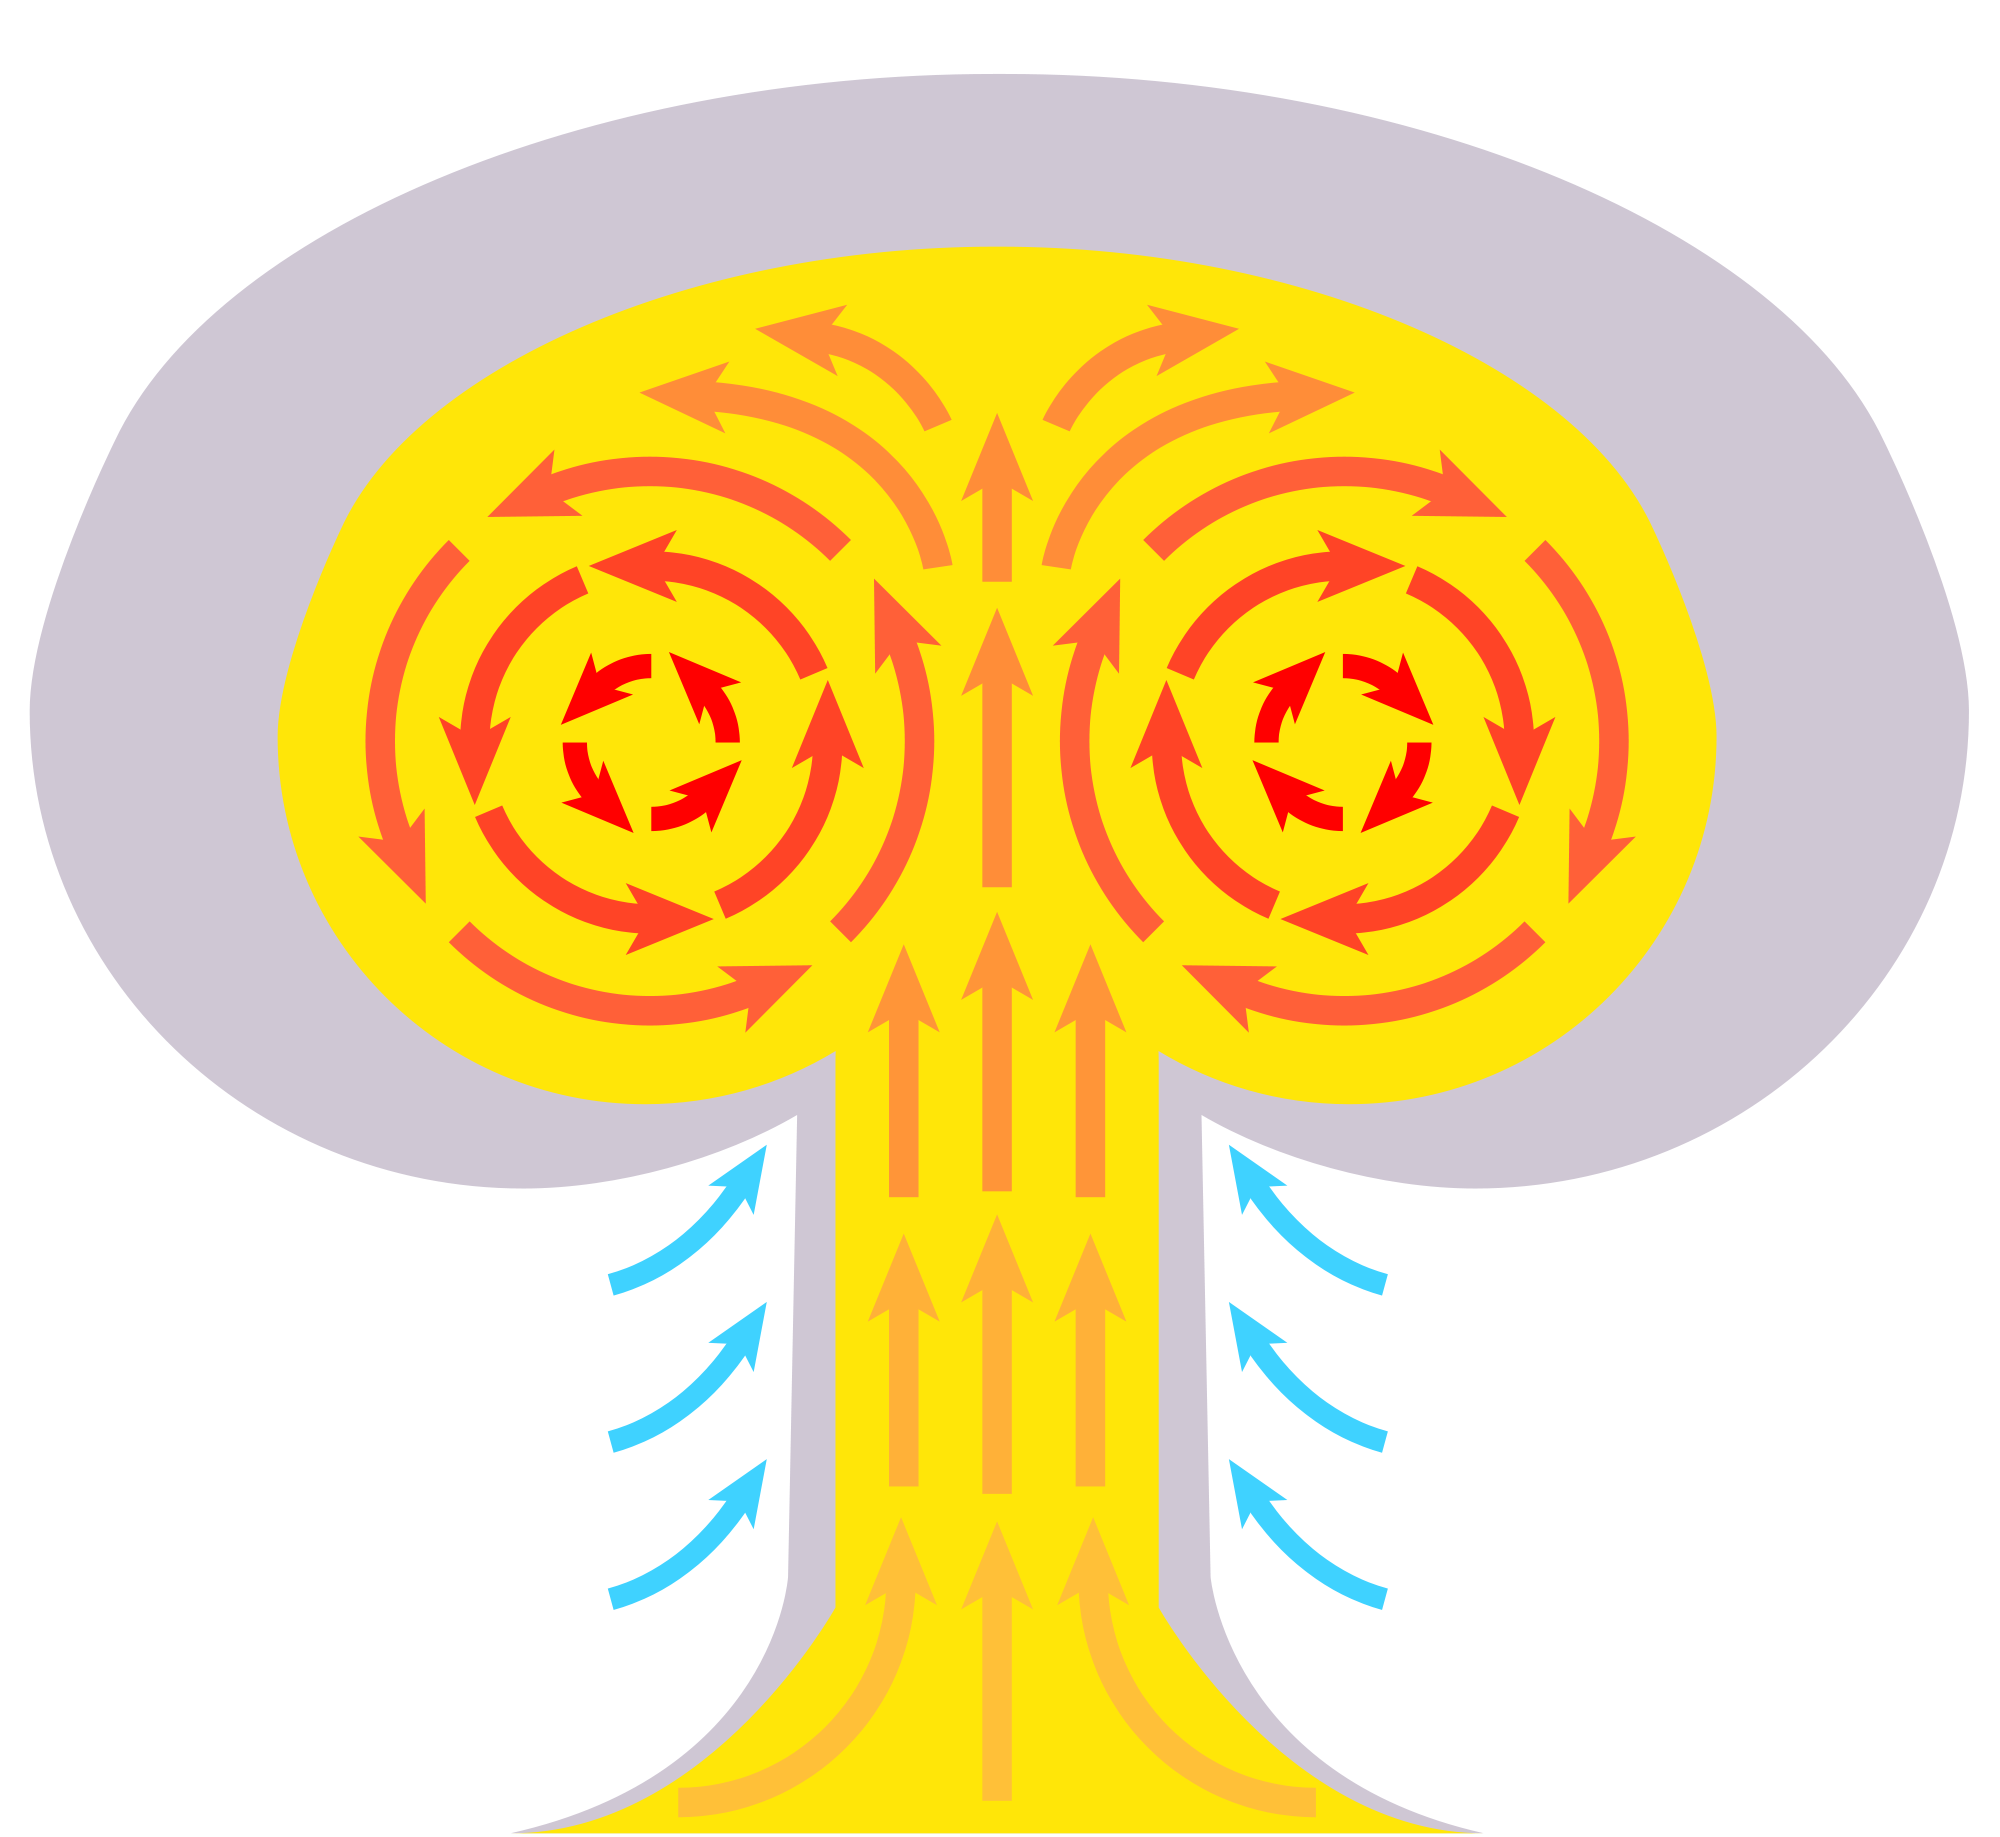 Hydrogen bomb clipart graphic free Mushroom cloud - Wikipedia graphic free